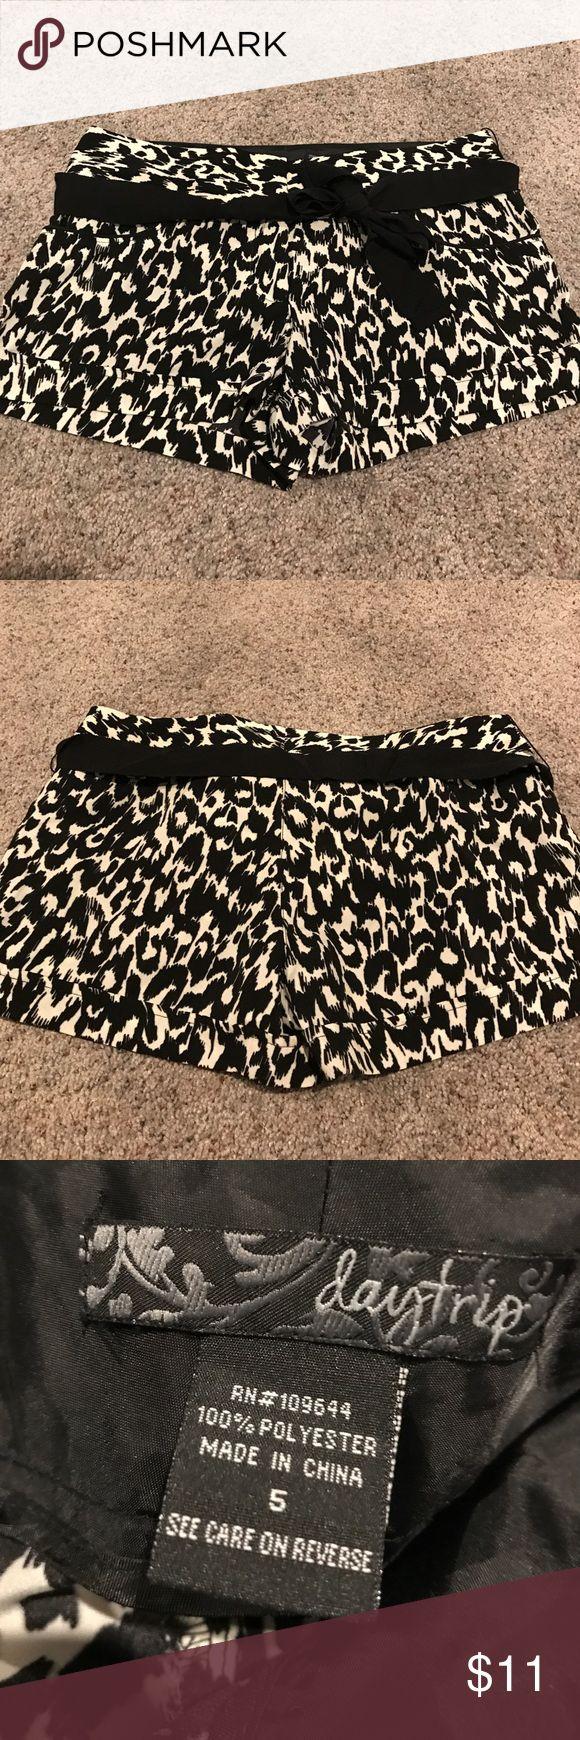 Daytrip black and cream shorts Daytrip black and cream shorts: size 5; 100% polyester Daytrip Shorts